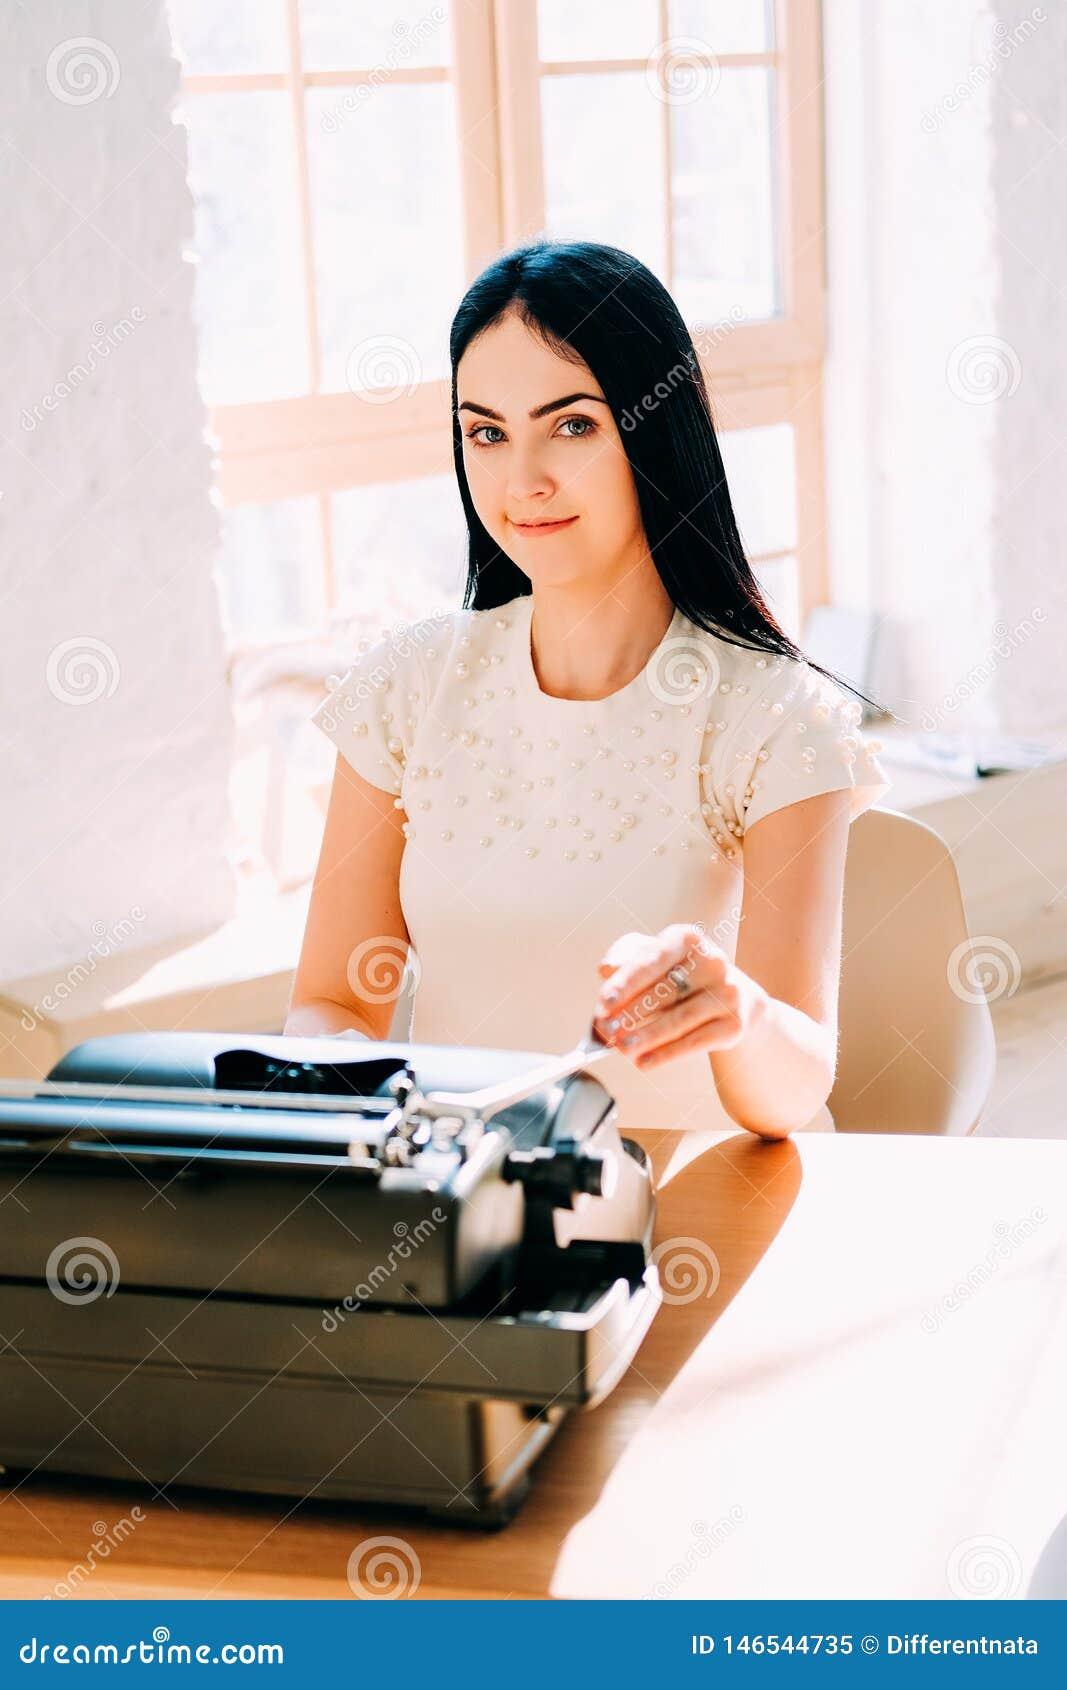 Working f?r folk f?r ockupation f?r h?rt jobb f?r aff?r professional Sekreterare i den vita kl?nningen som skriver dokument